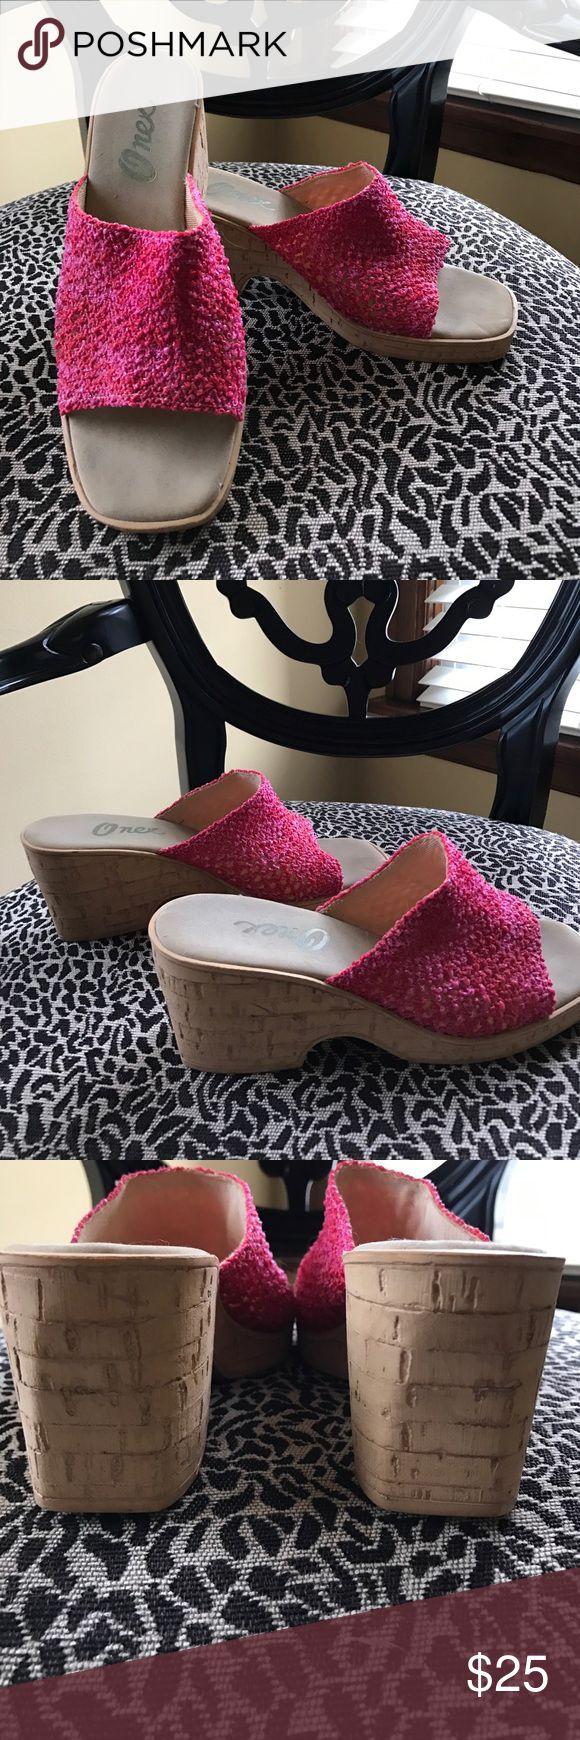 Onex slip on sandals Onex slip on sandals, faux cork sides. Great for summer🌸 ONEX Shoes Sandals